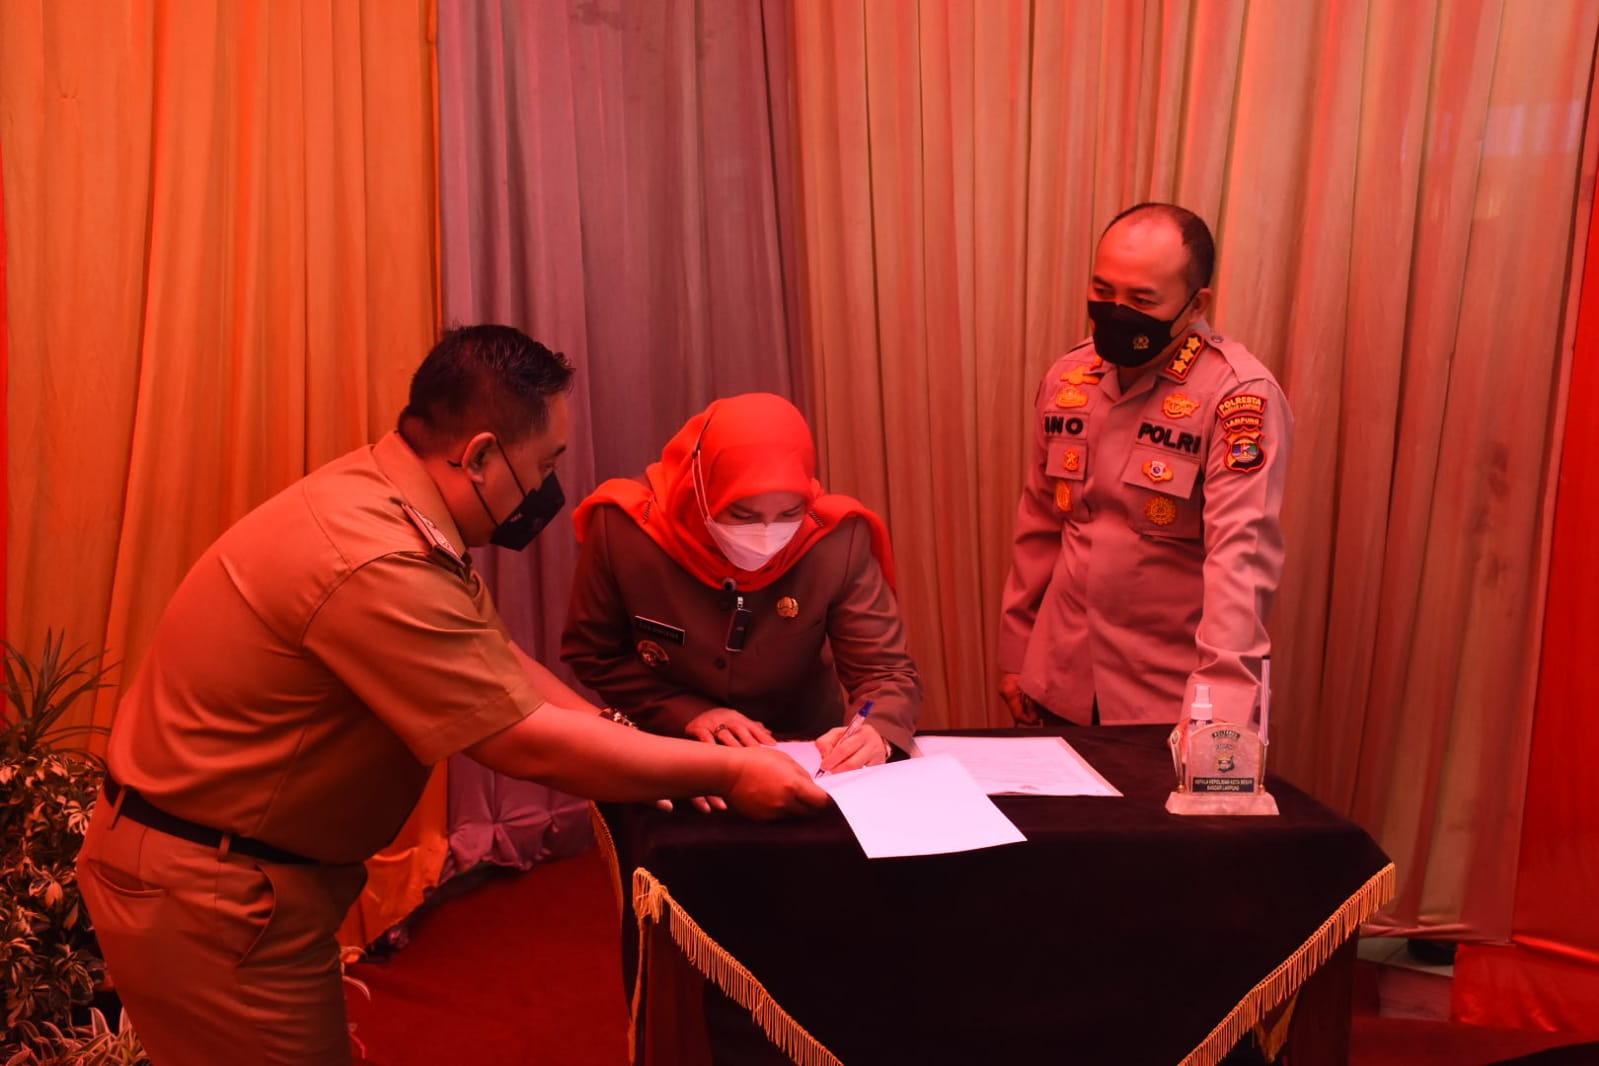 HIBAH TANAH. Walikota Bandarlampung, Eva Dwiana saat menandatangani dokumen hibah tanah dan bangunan Mapolsek Teluk Betung Timur, pada Senin (4/10). FOTO. DOK